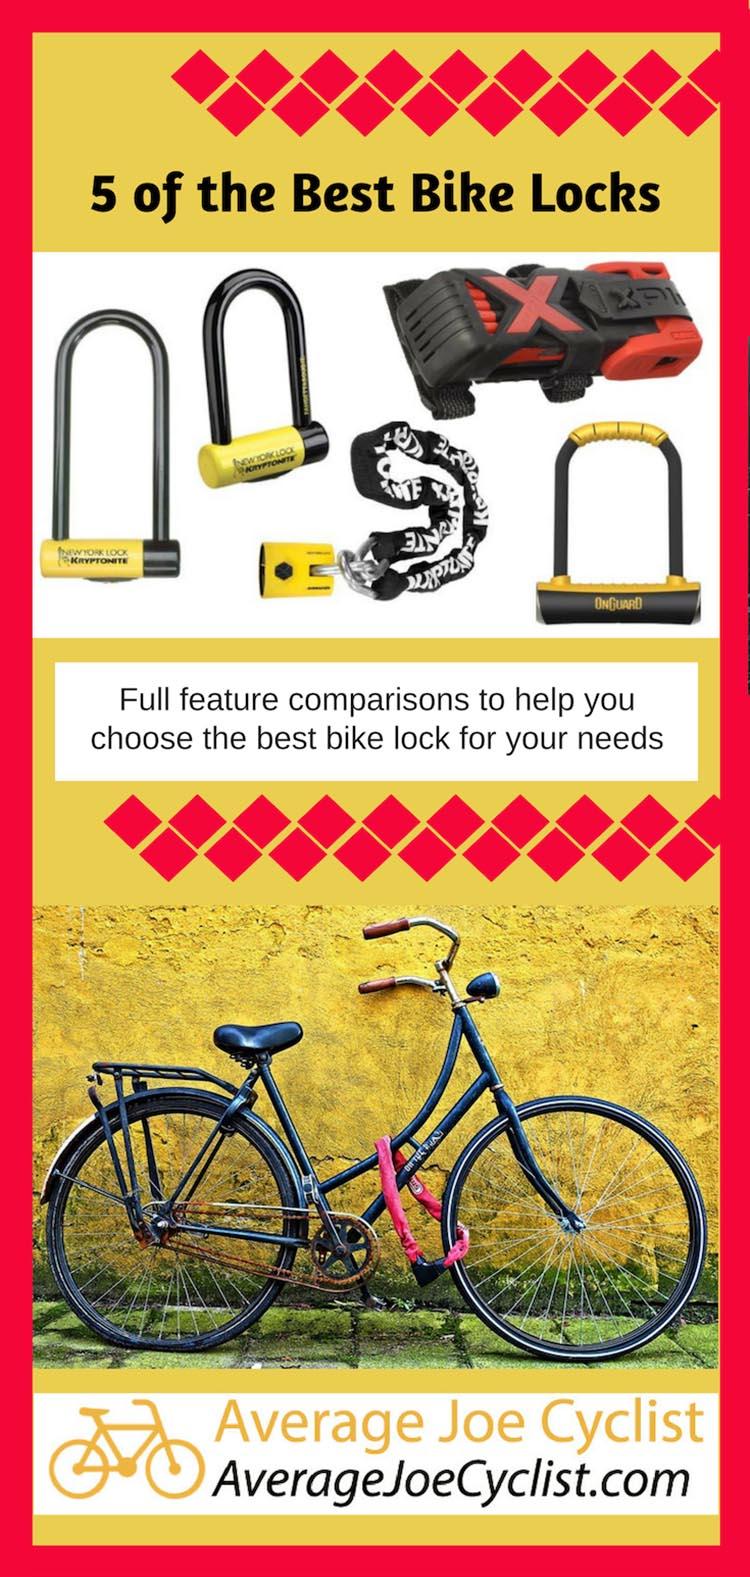 5 of the Best Bike Locks.